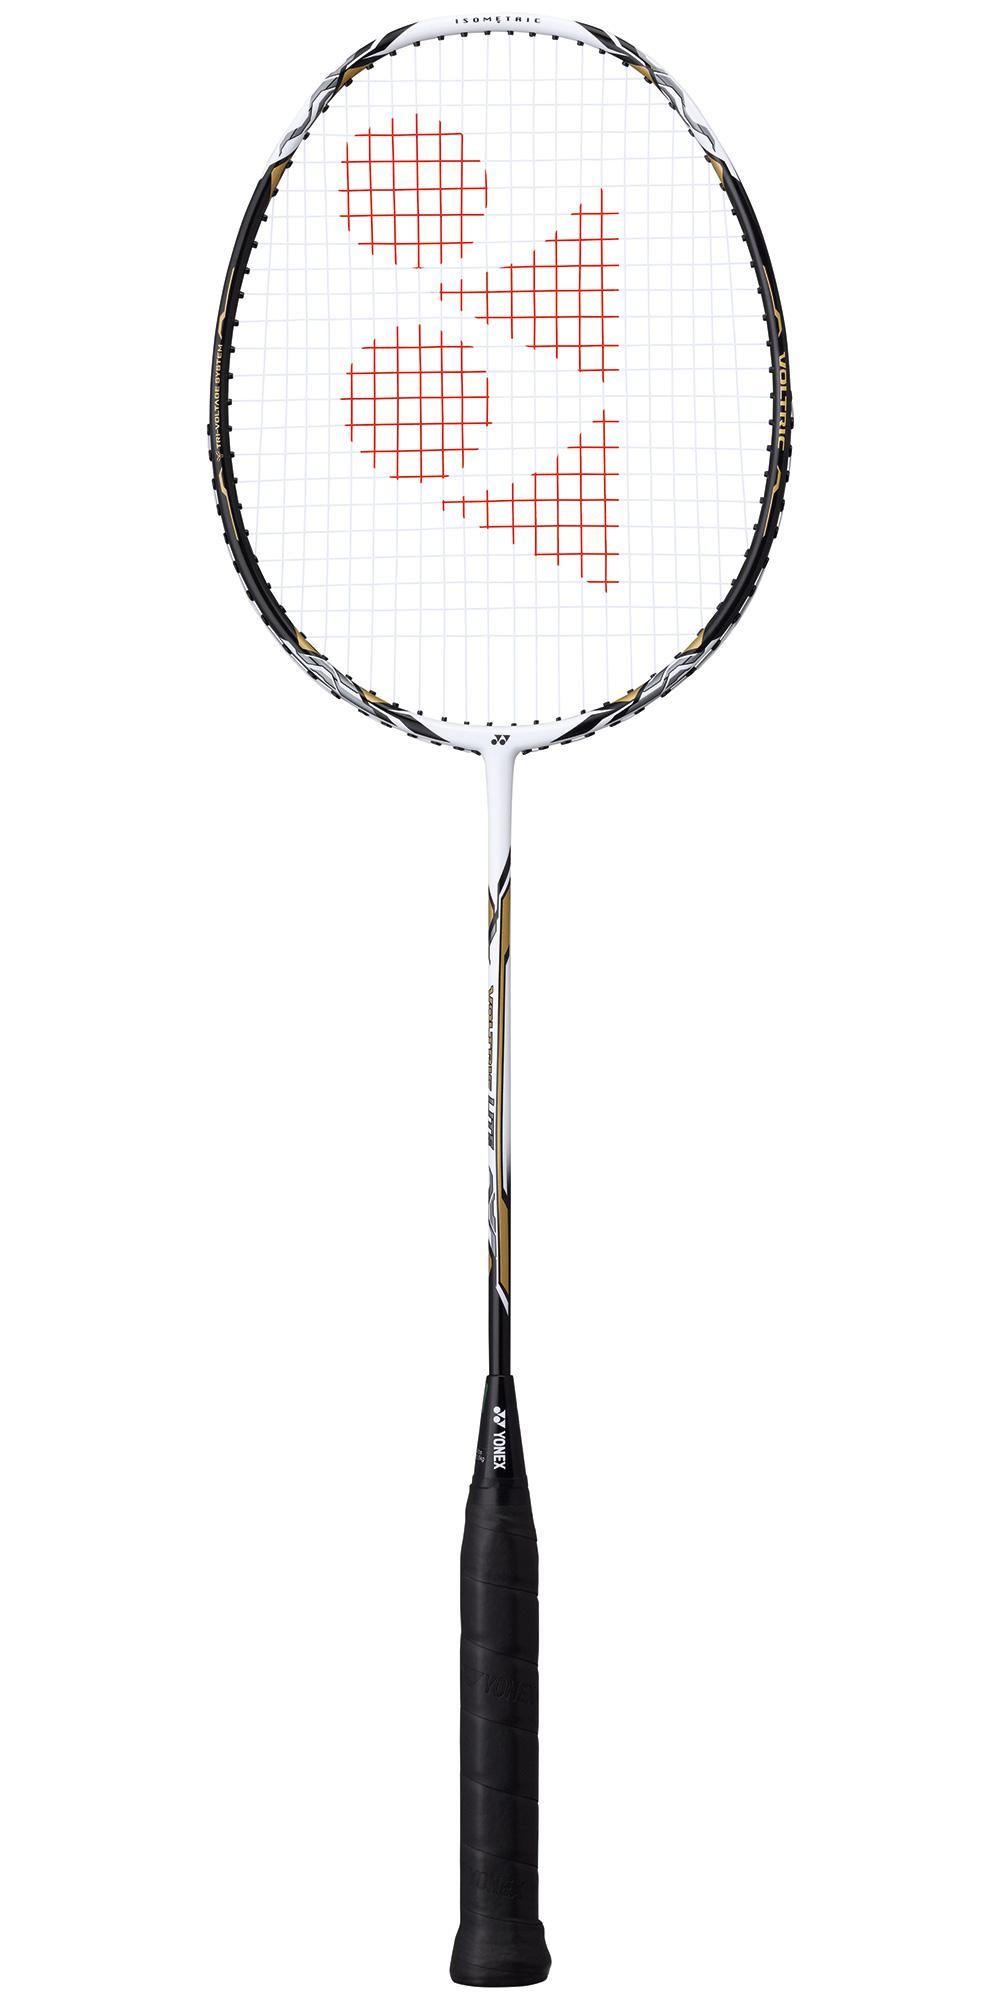 Yonex Voltric Lite Badminton Racket - White/Black (2016) - Tennisnuts.com